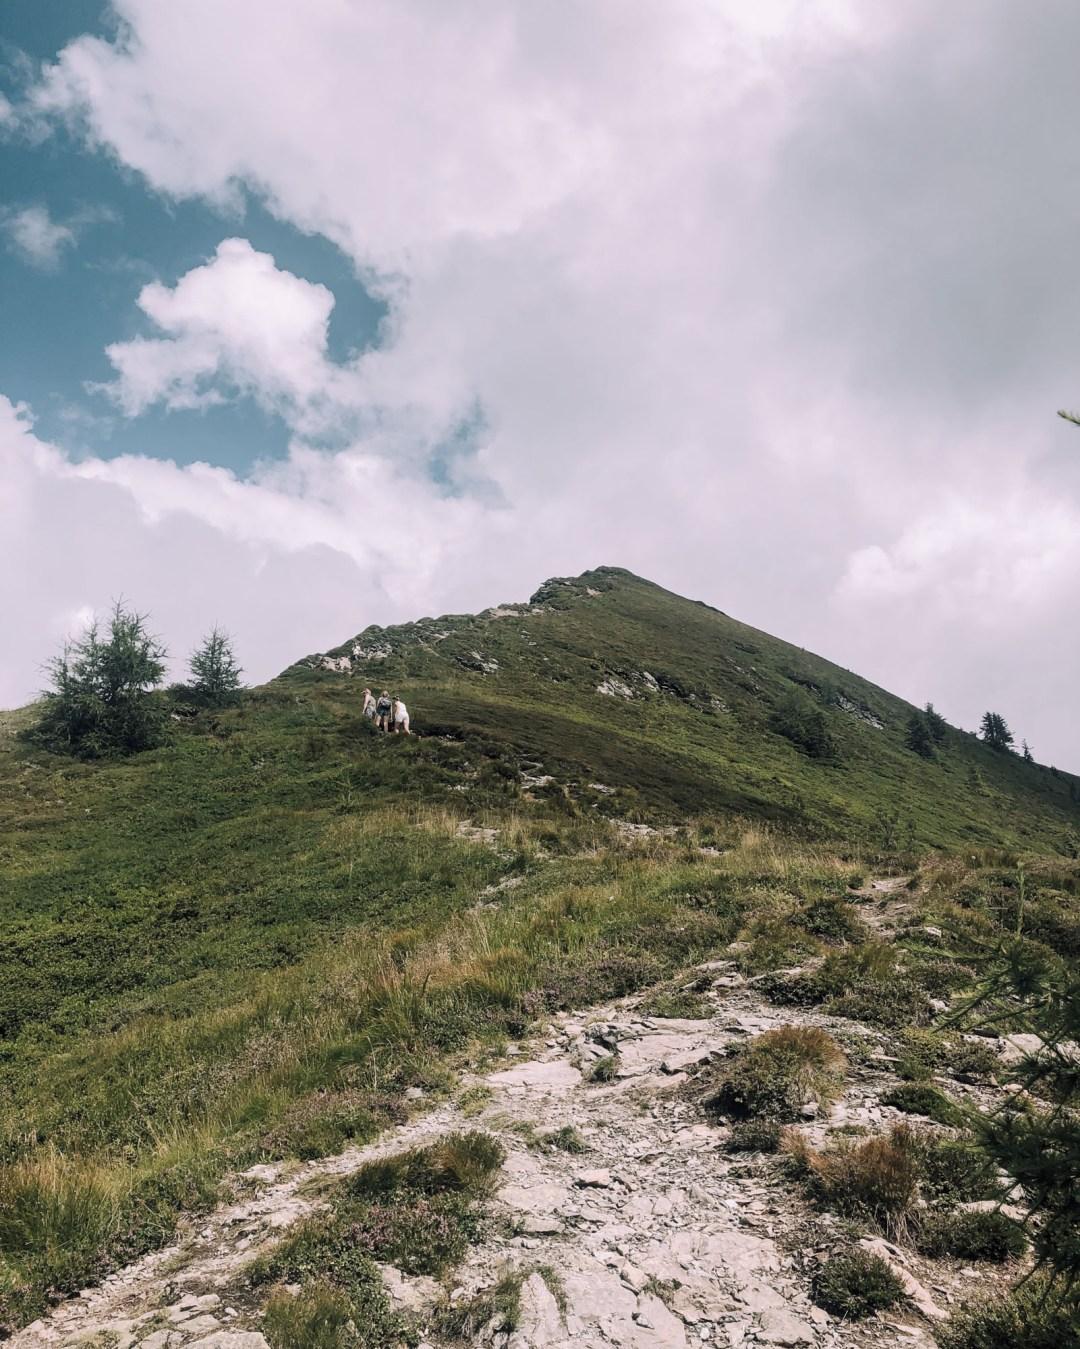 inastil, over50blogger, Alpbach, Alpbacherhof, Tirol, Austria, Visittirol, Wandern, Mountainbike, travelblogger, traveldiary, Urlaub, Urlaubinösterreich-6